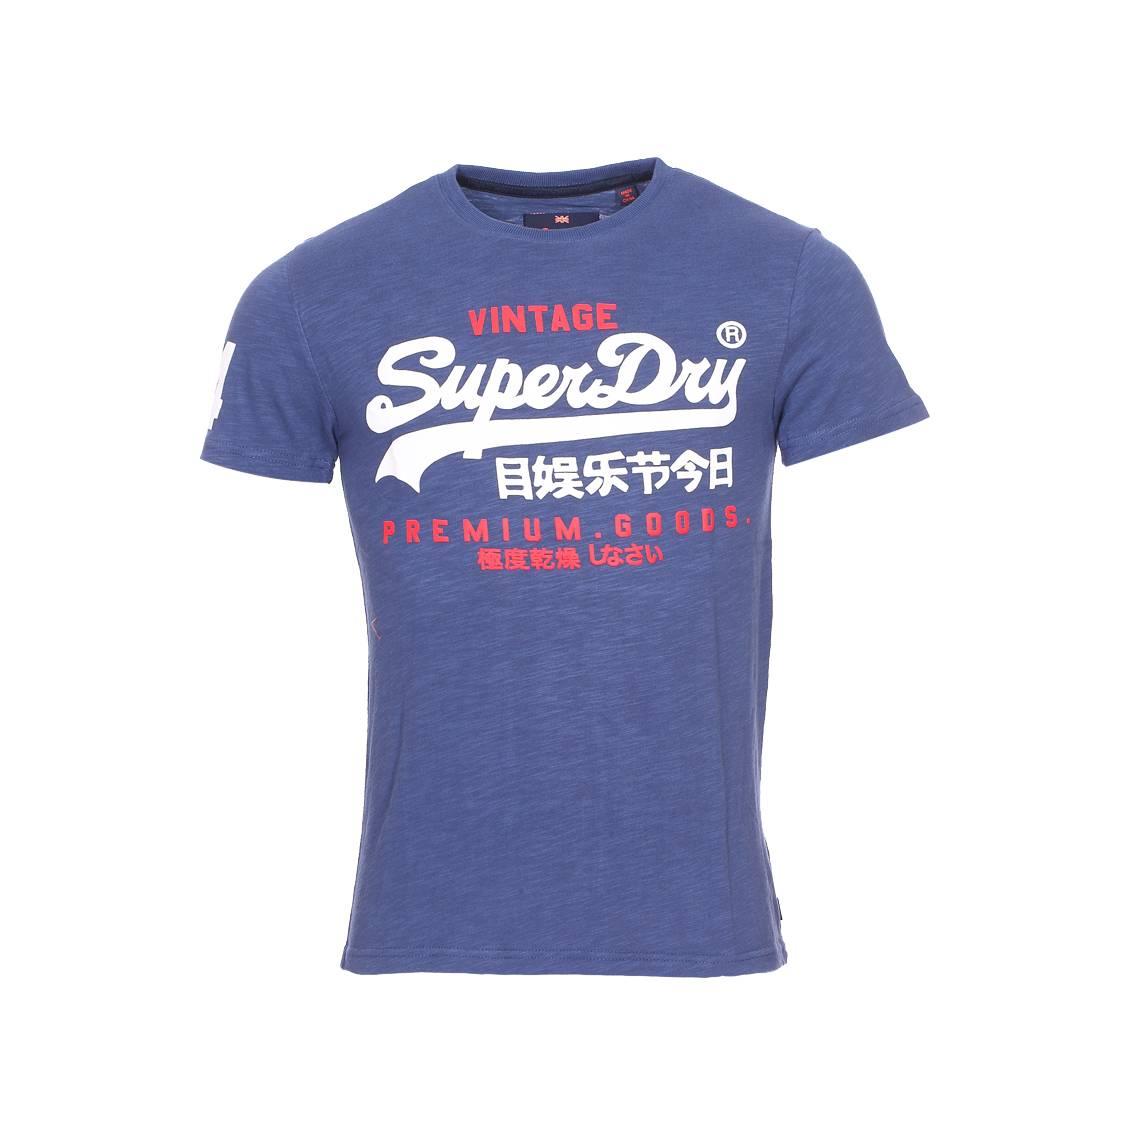 49b6fcda5f1b Tee-shirt col rond Superdry Premium Goods en coton flammé bleu indigo  floqué ...